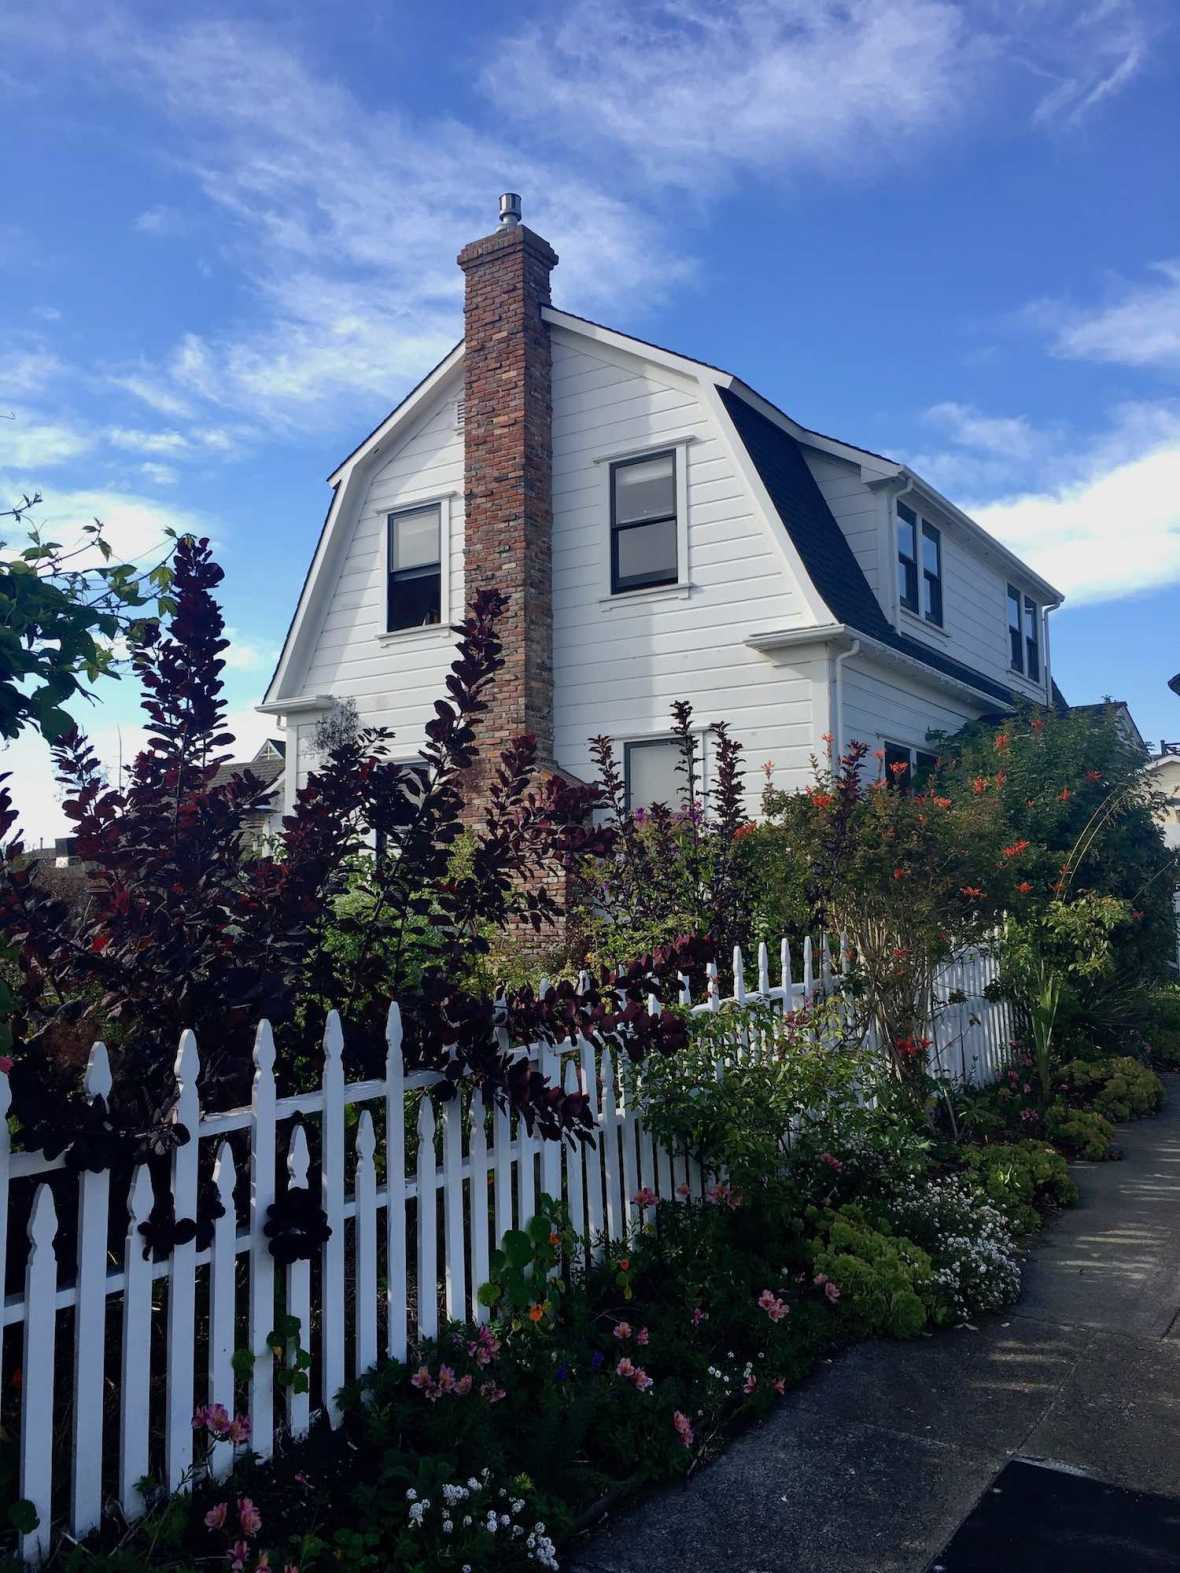 Gardens and New England village architecture in Mendocino, California